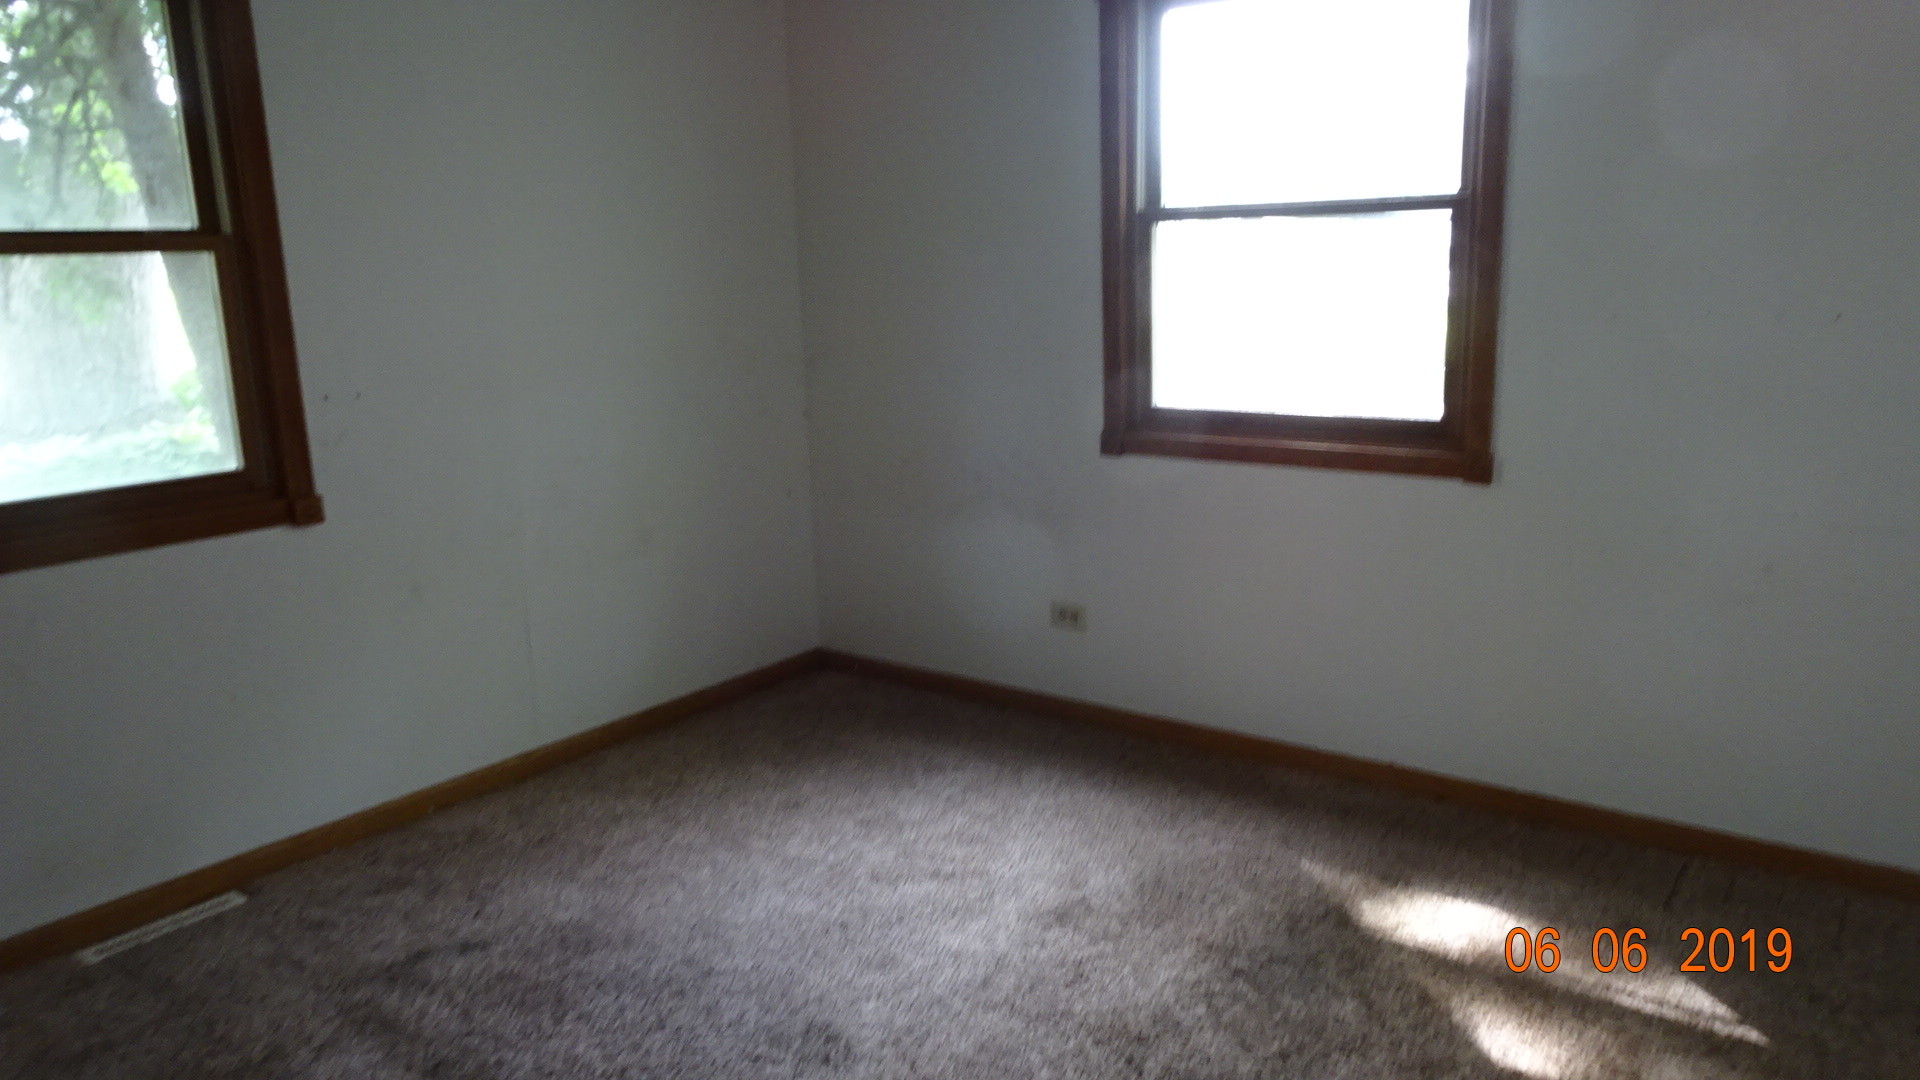 359 LAKEWOOD, Antioch, Illinois, 60002